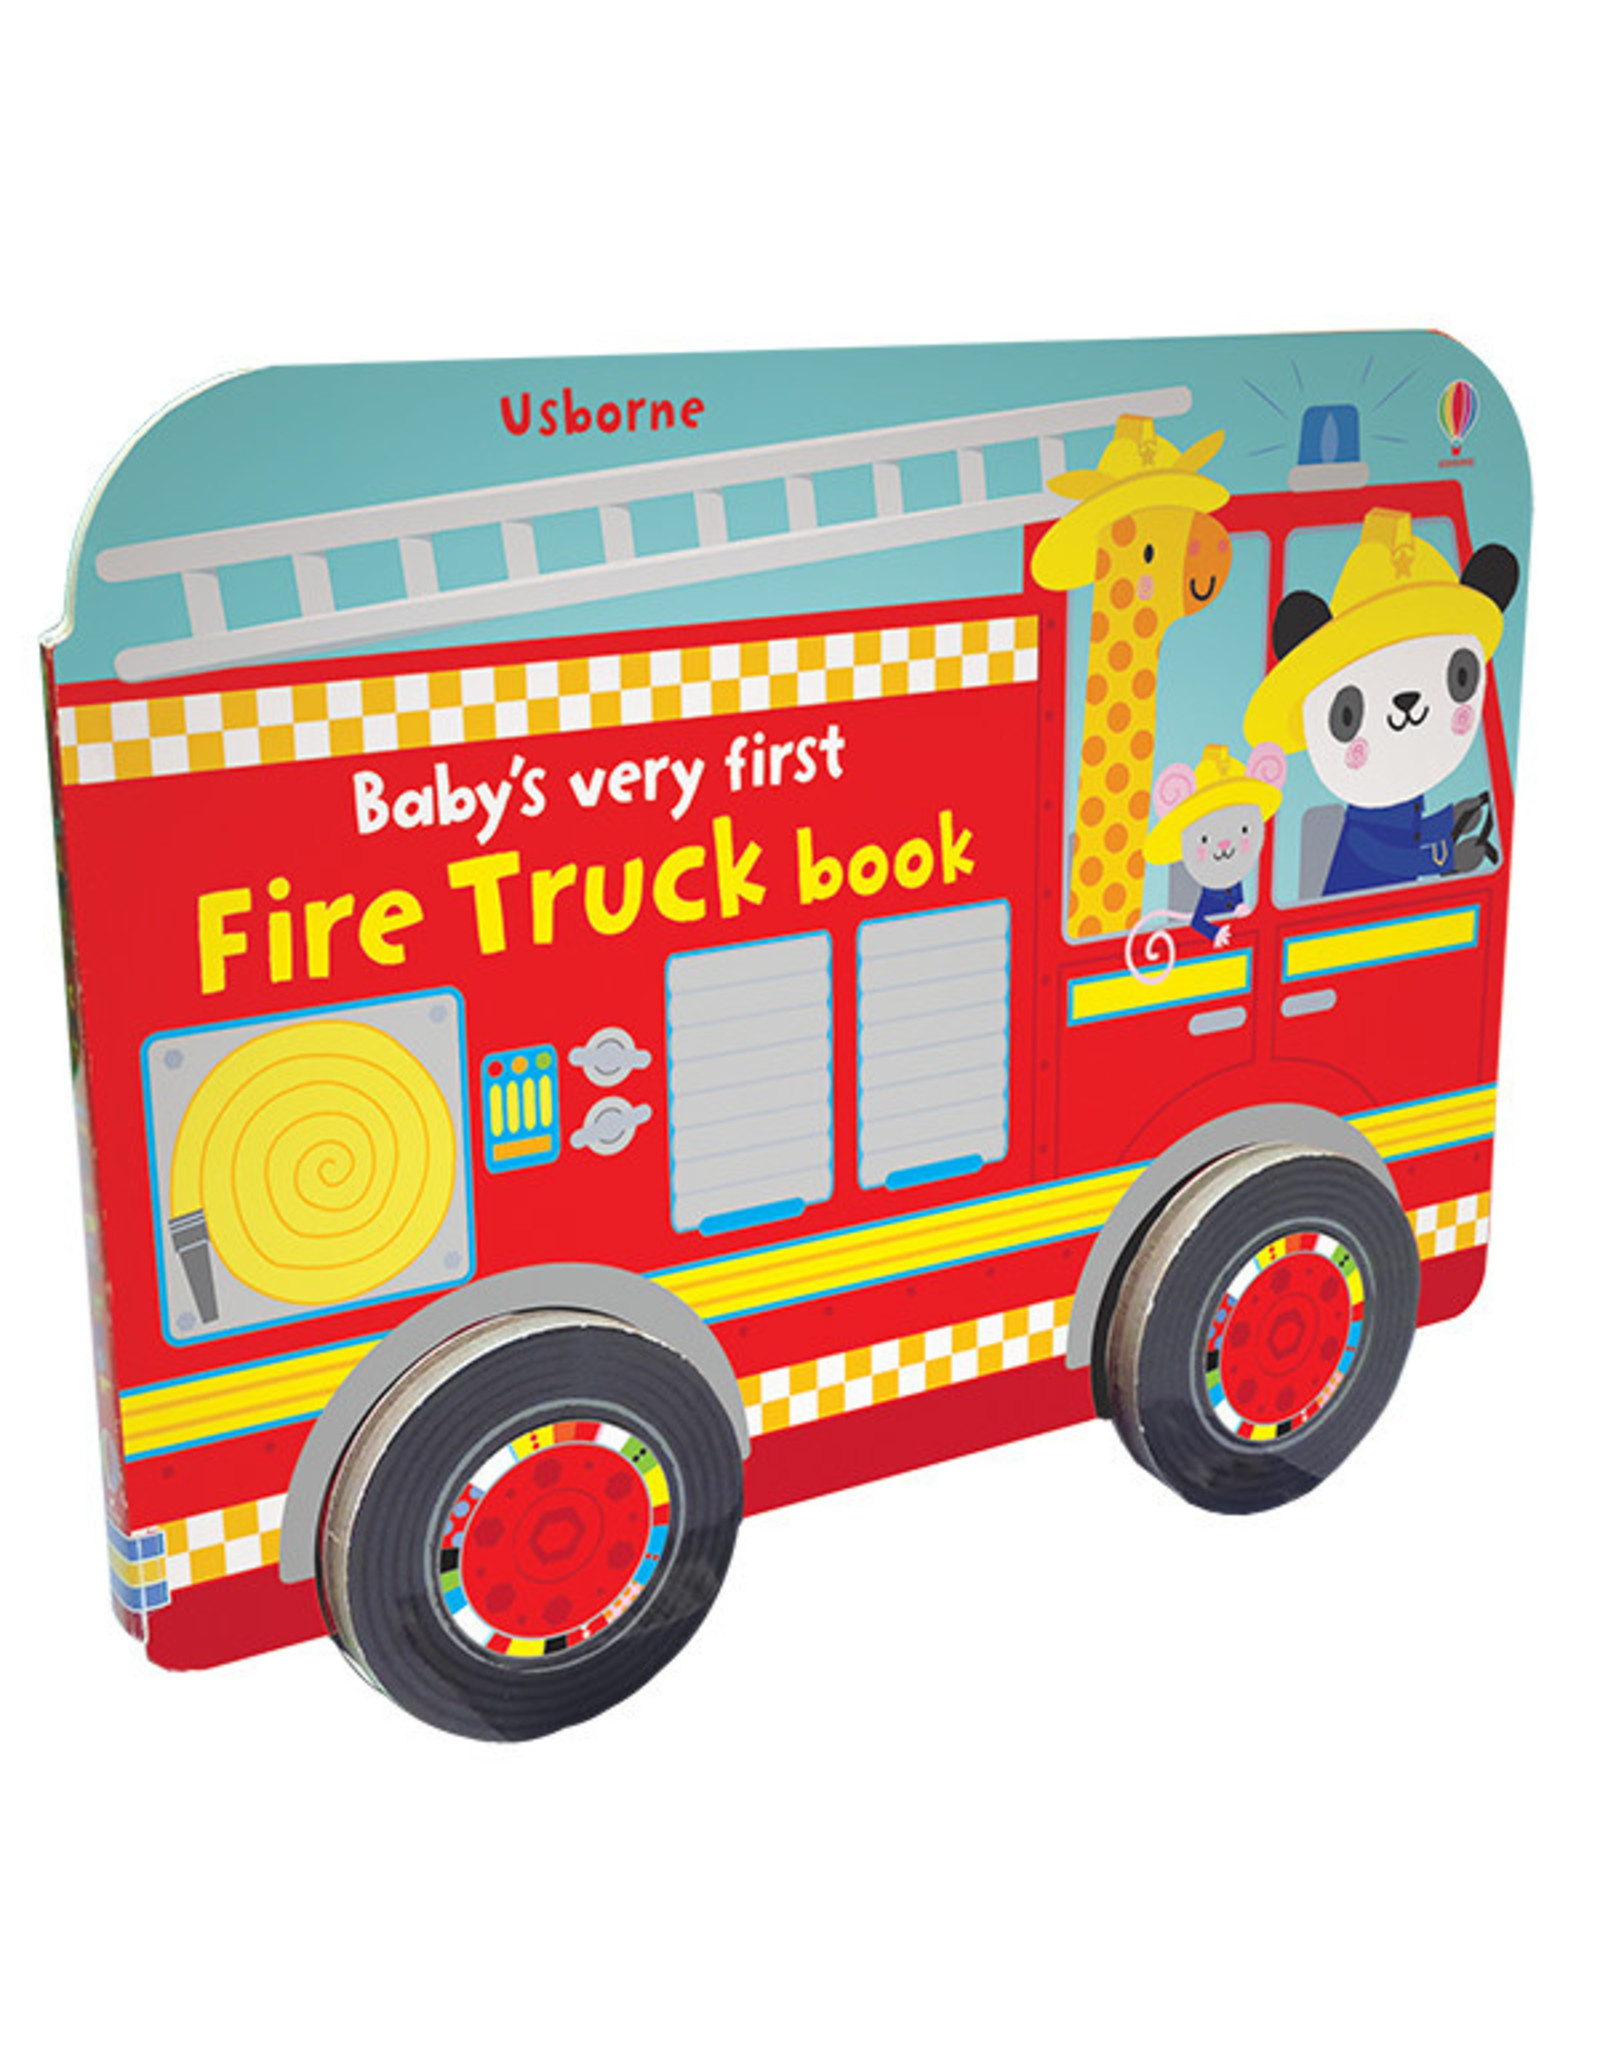 Usborne & Kane Miller Books Baby 's Very First Fire Truck Book